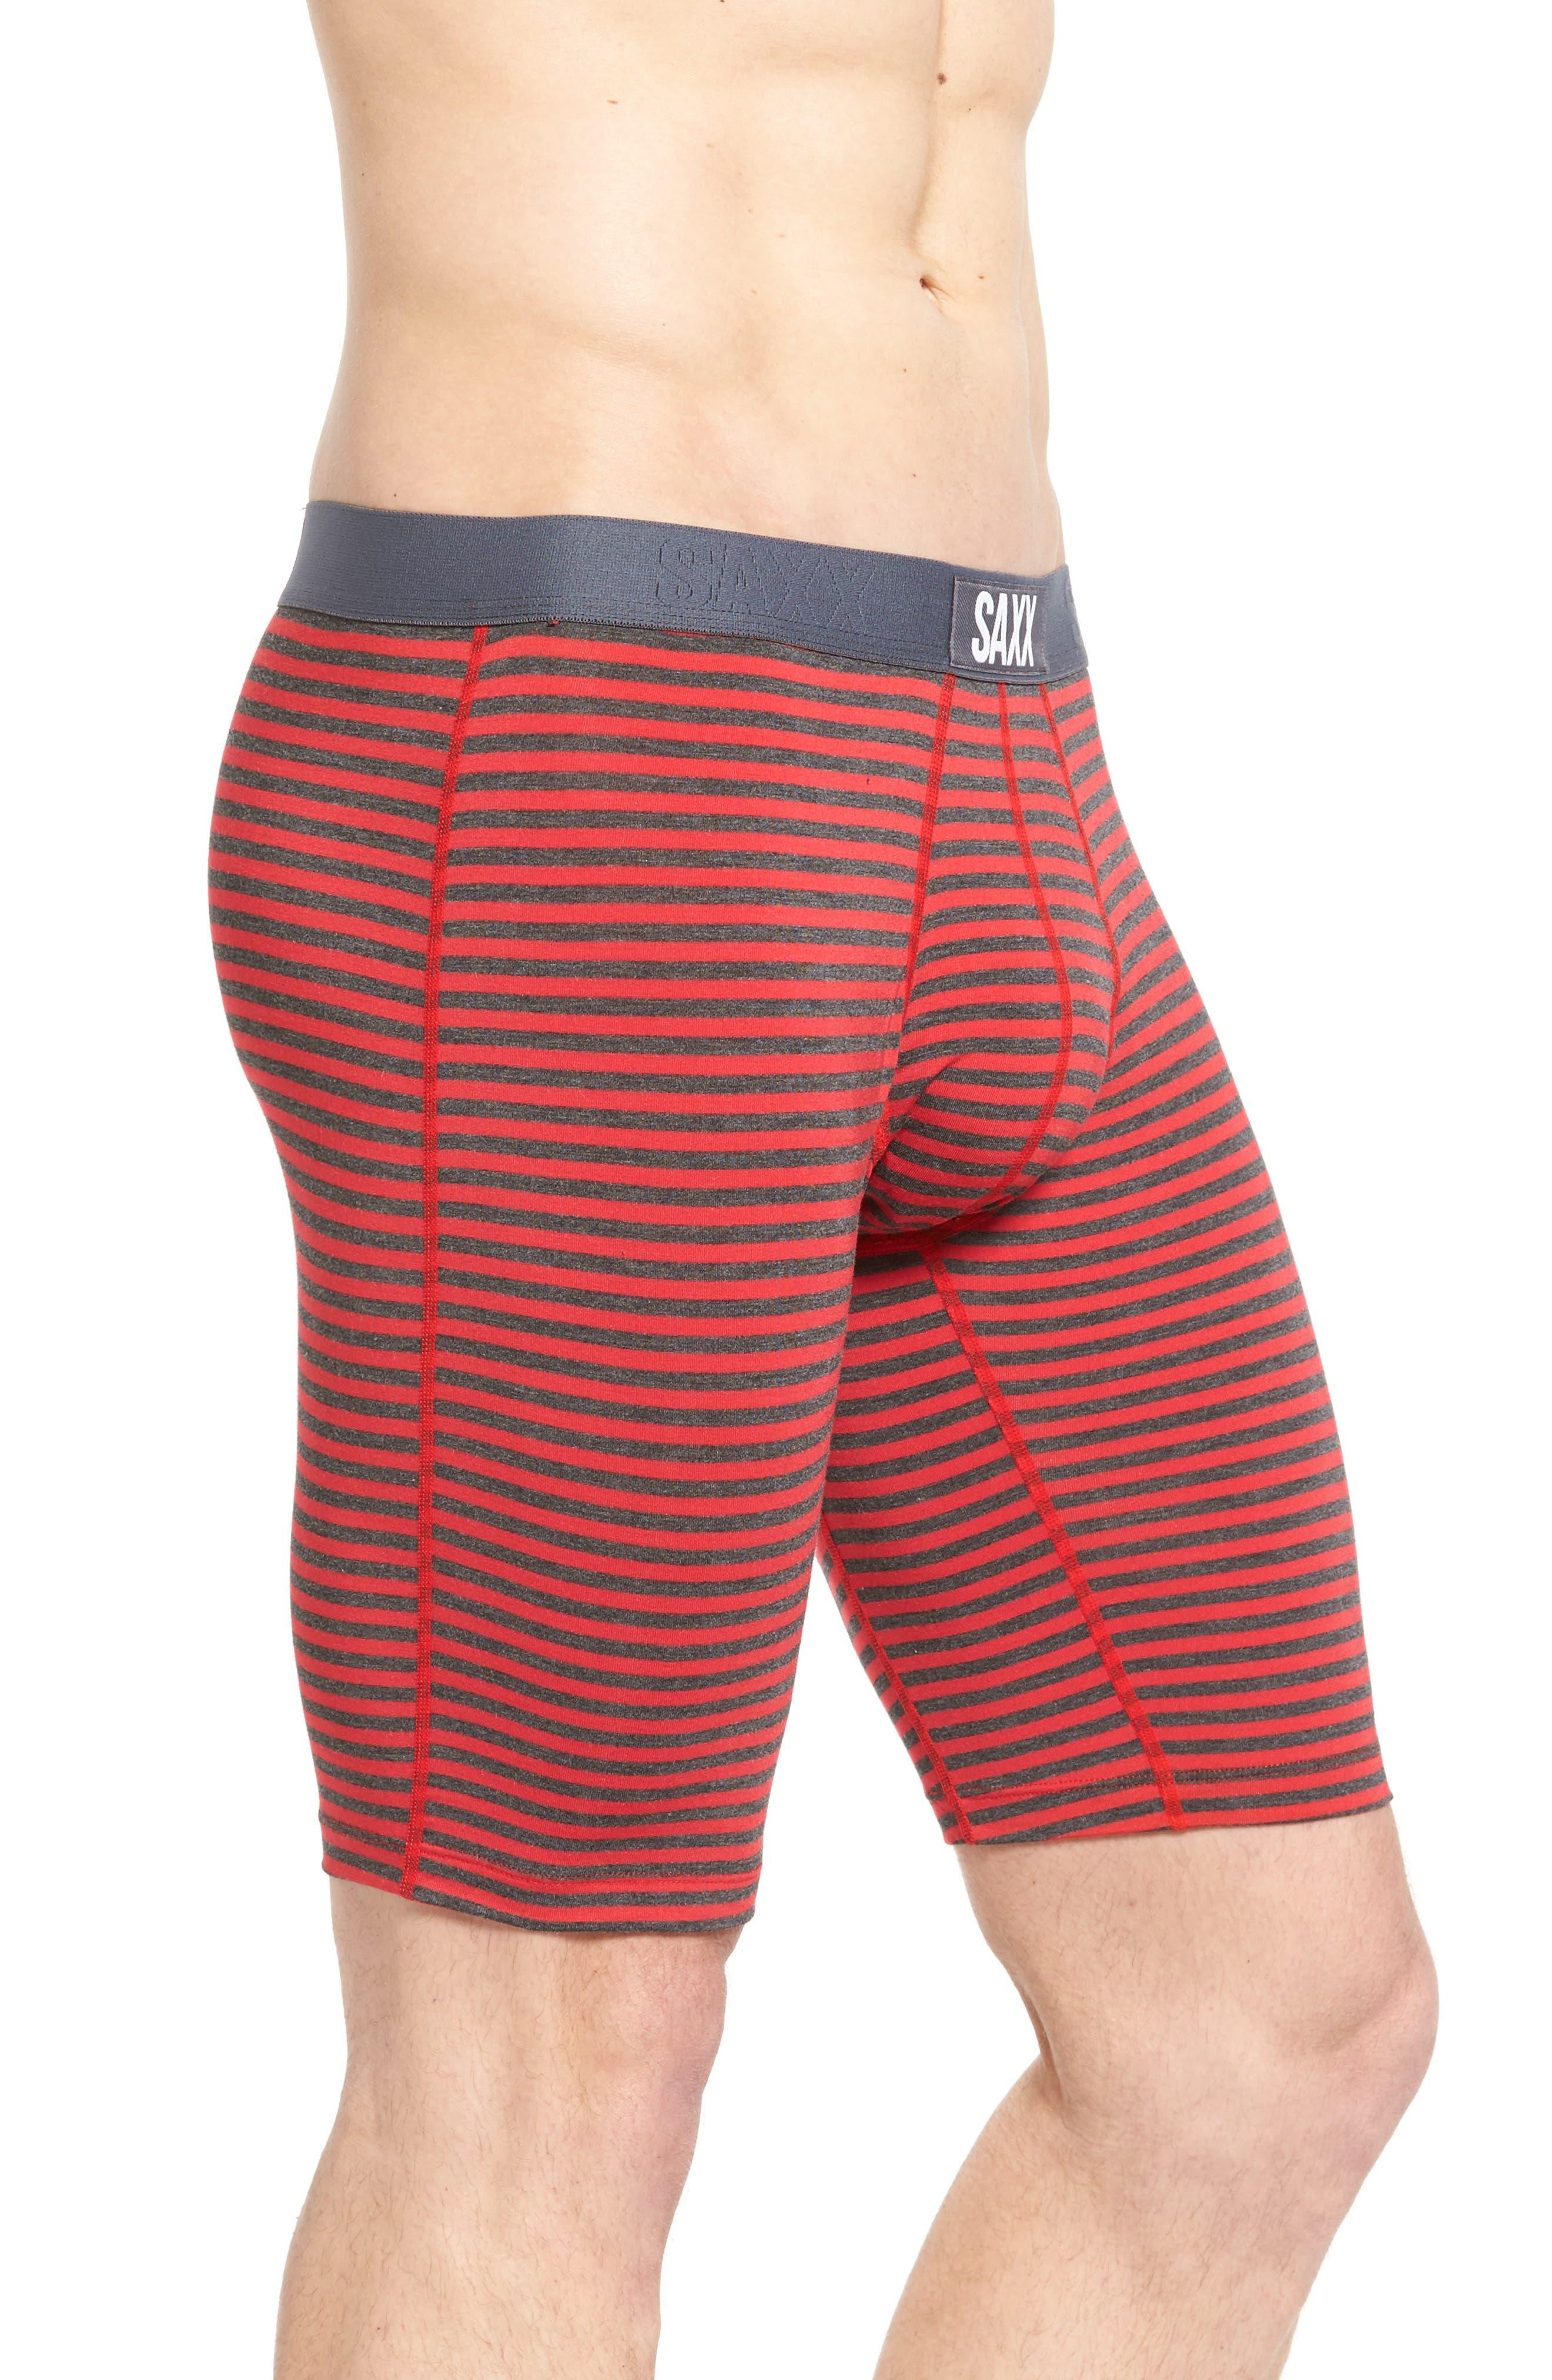 Vibe Boxer Briefs,                             Alternate thumbnail 3, color,                             Red Hiker Stripe